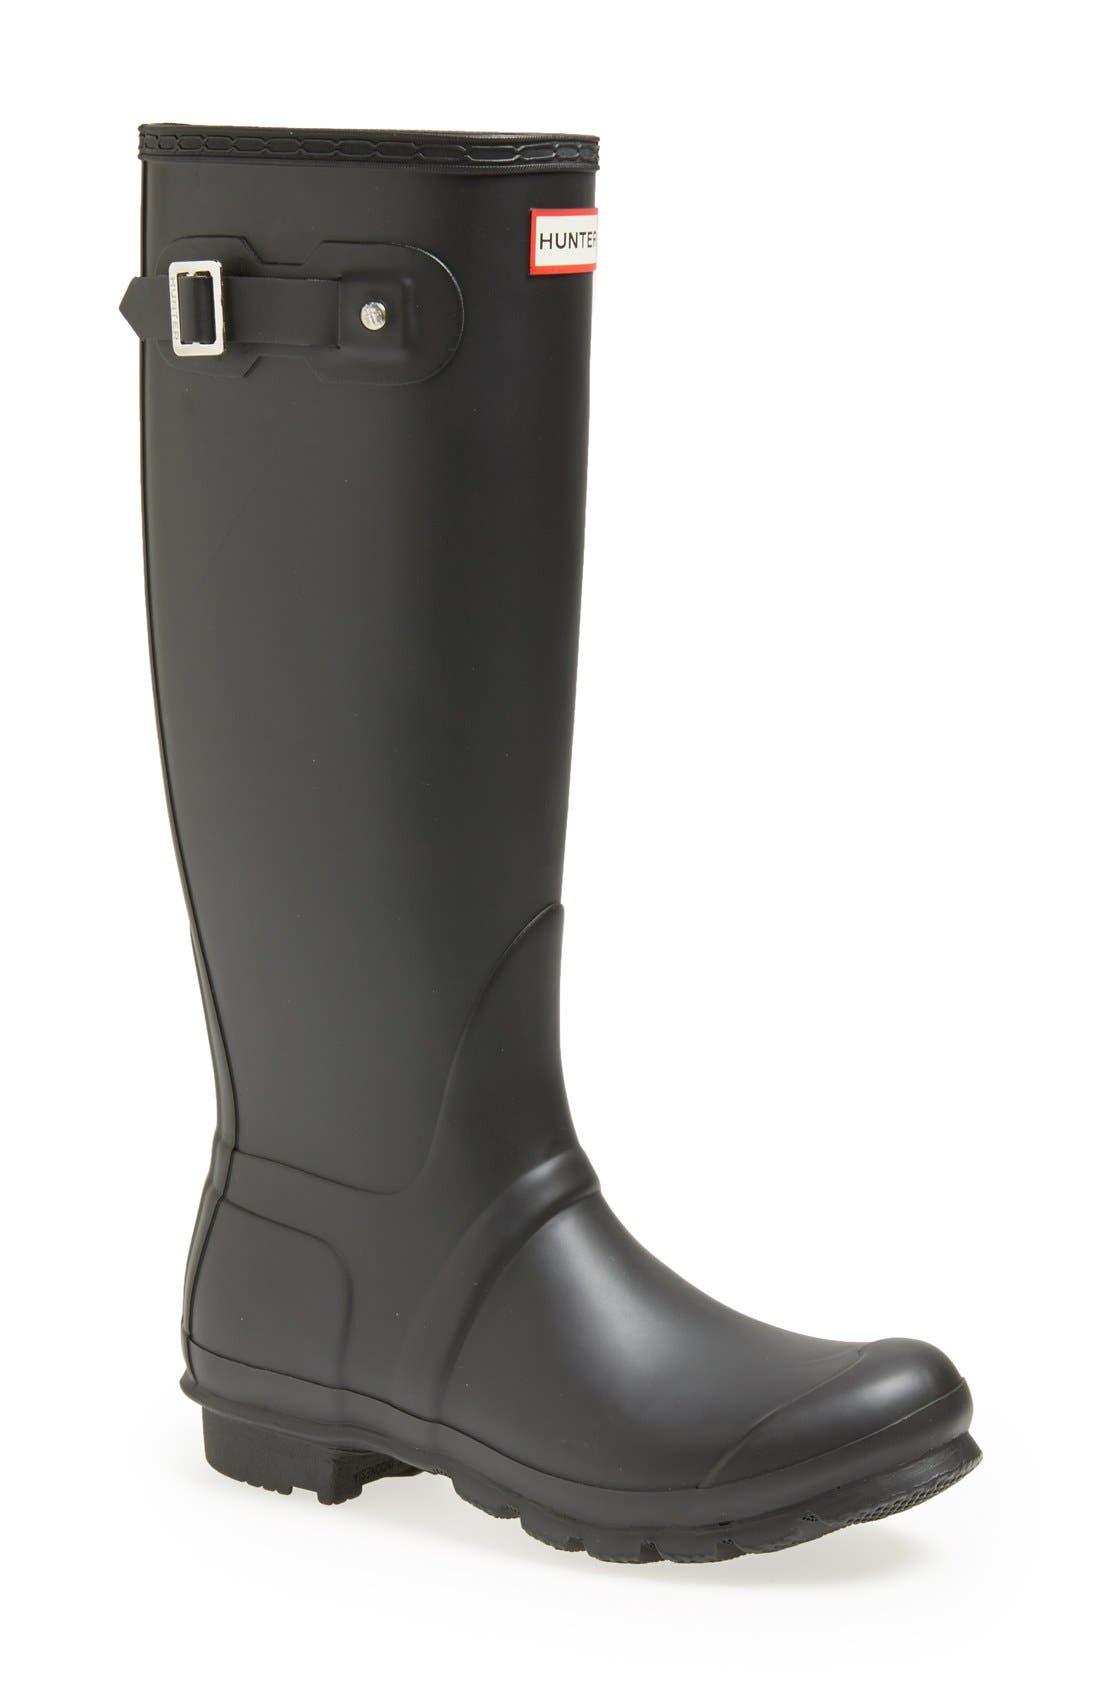 Alternate Image 1 Selected - Hunter 'Original Tall' Rain Boot (Women)